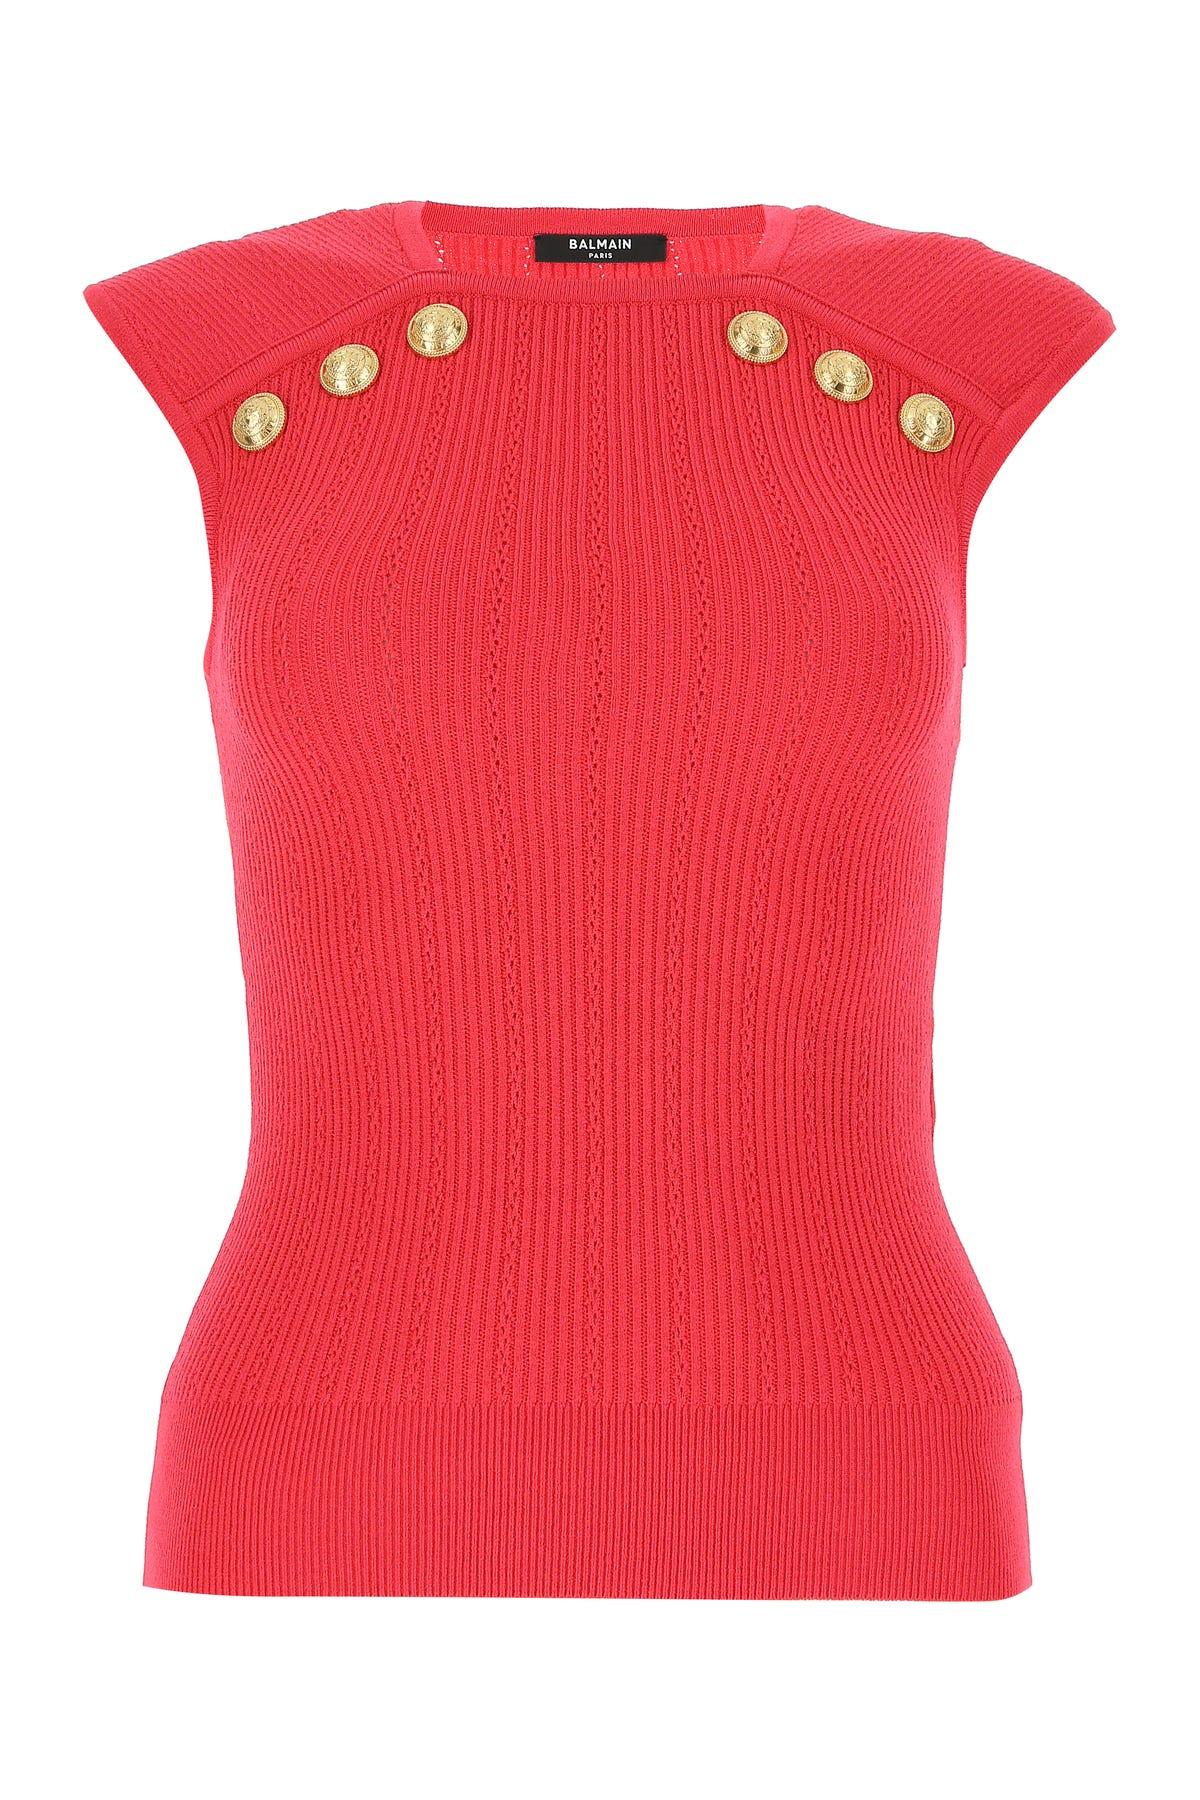 Balmain Shirts CORAL VISCOSE BLEND TOP  RED BALMAIN DONNA 40F